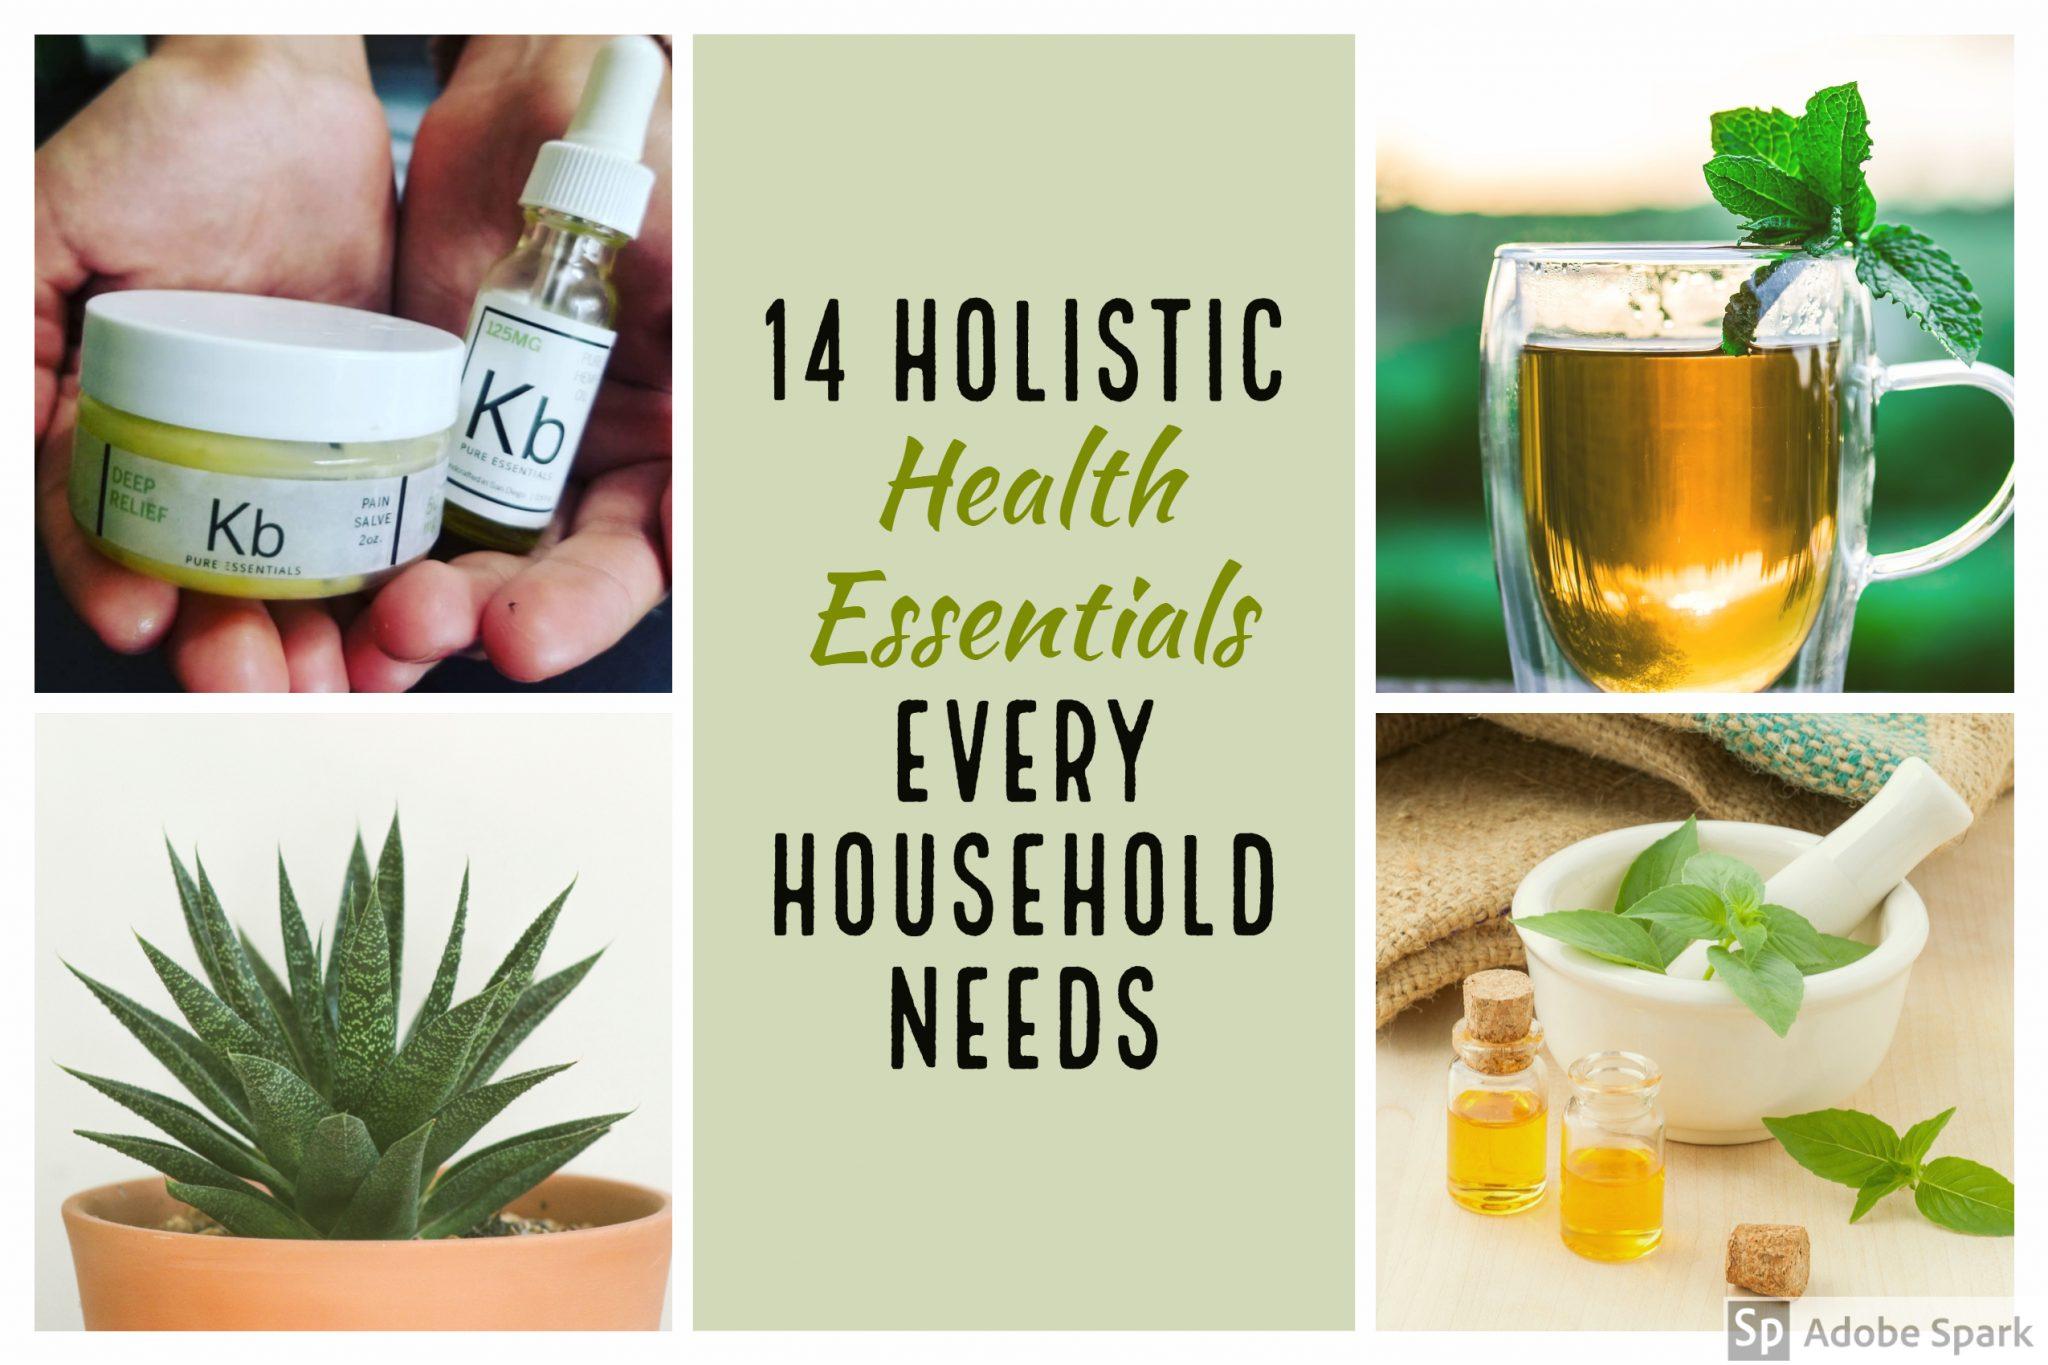 14 Holistic Health Essentials Every Household Needs